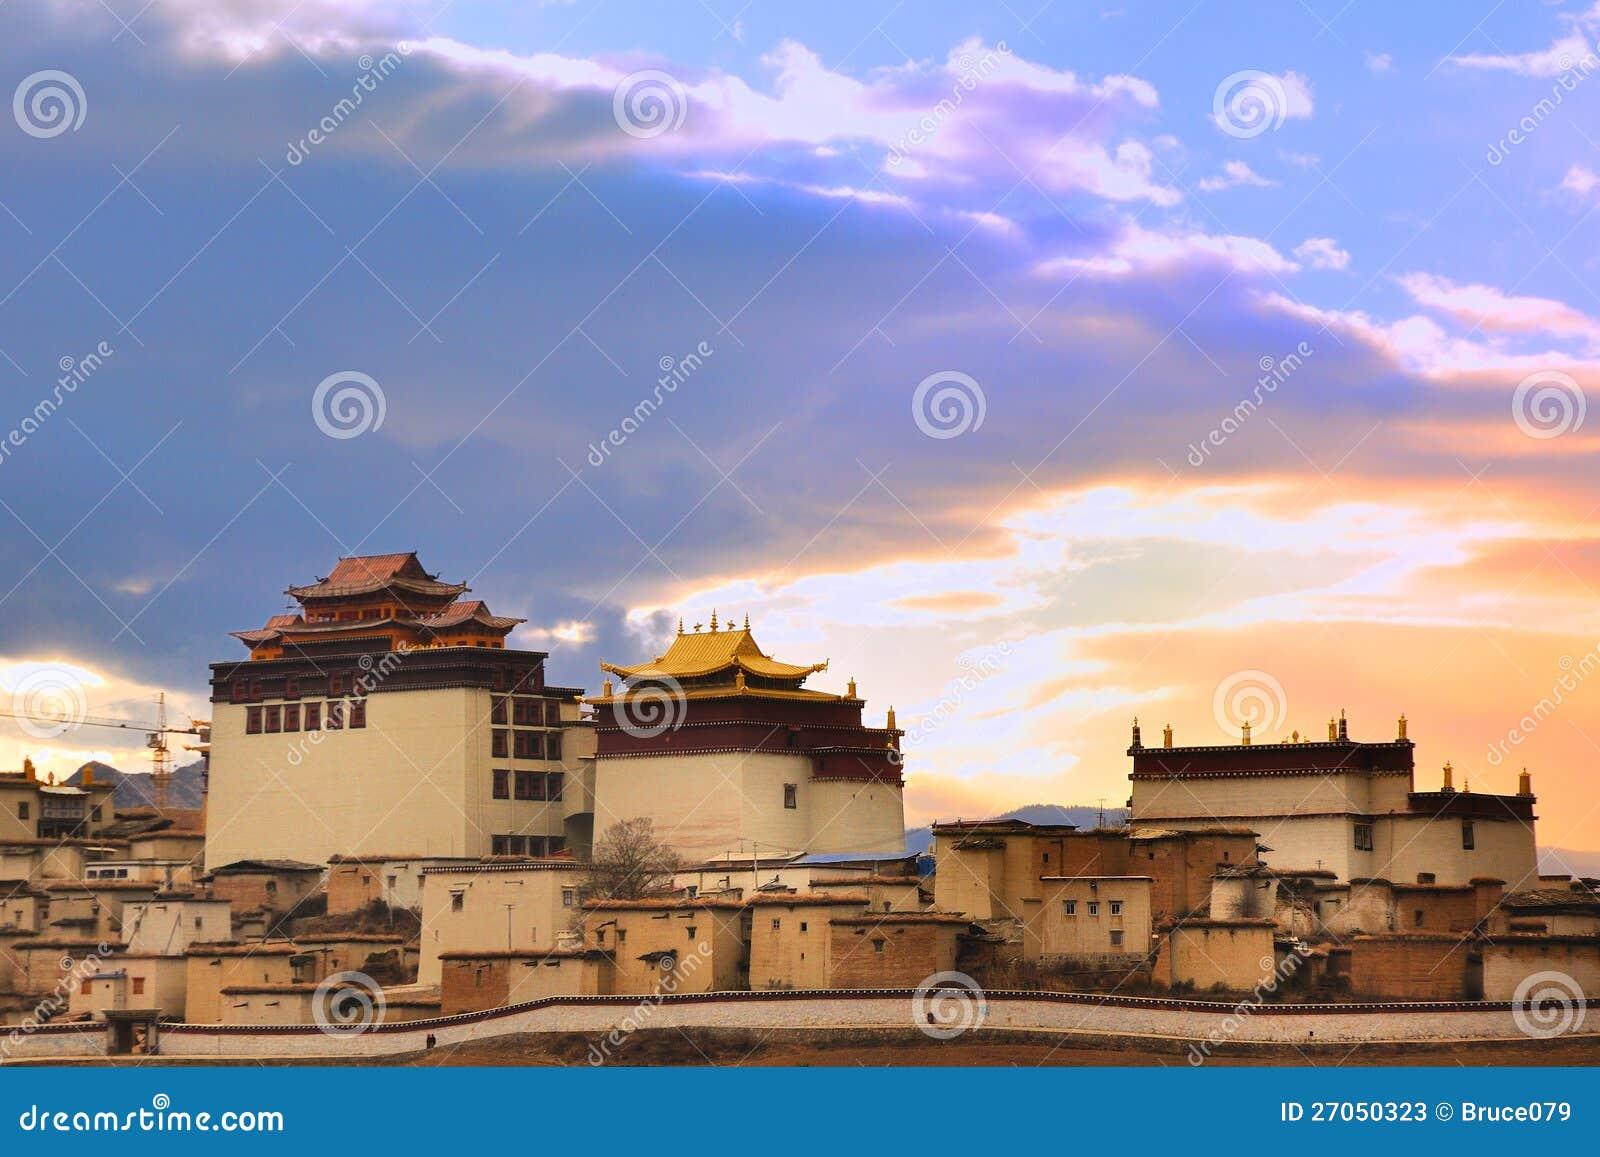 song zan lin temple in Shangri-la